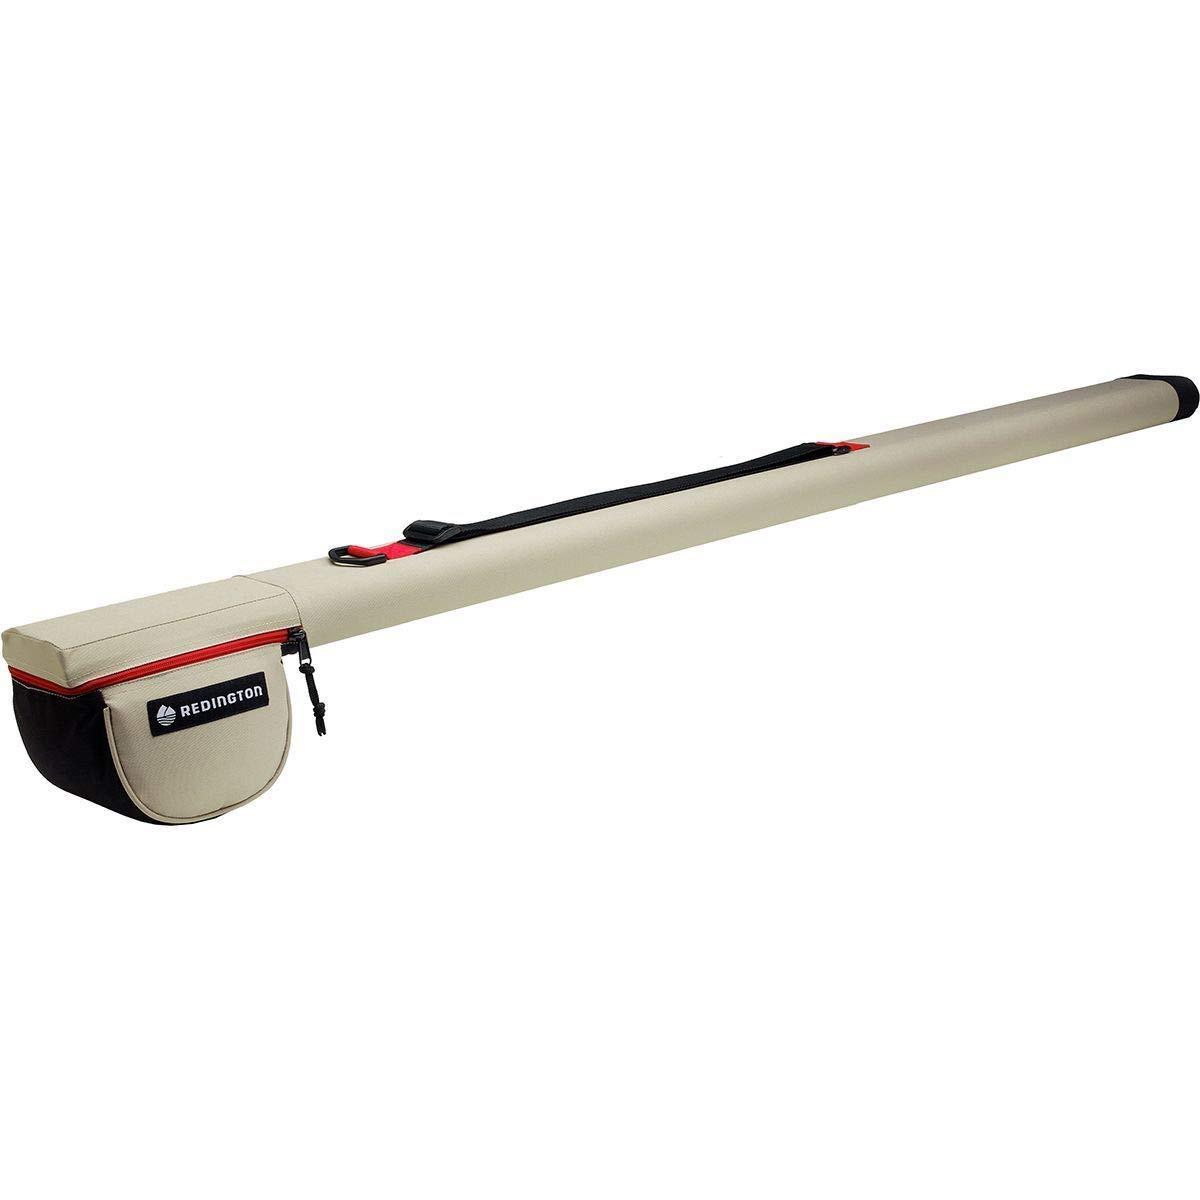 Redington Rod Single/Double Travel Case Single, 10ft, 4 PC